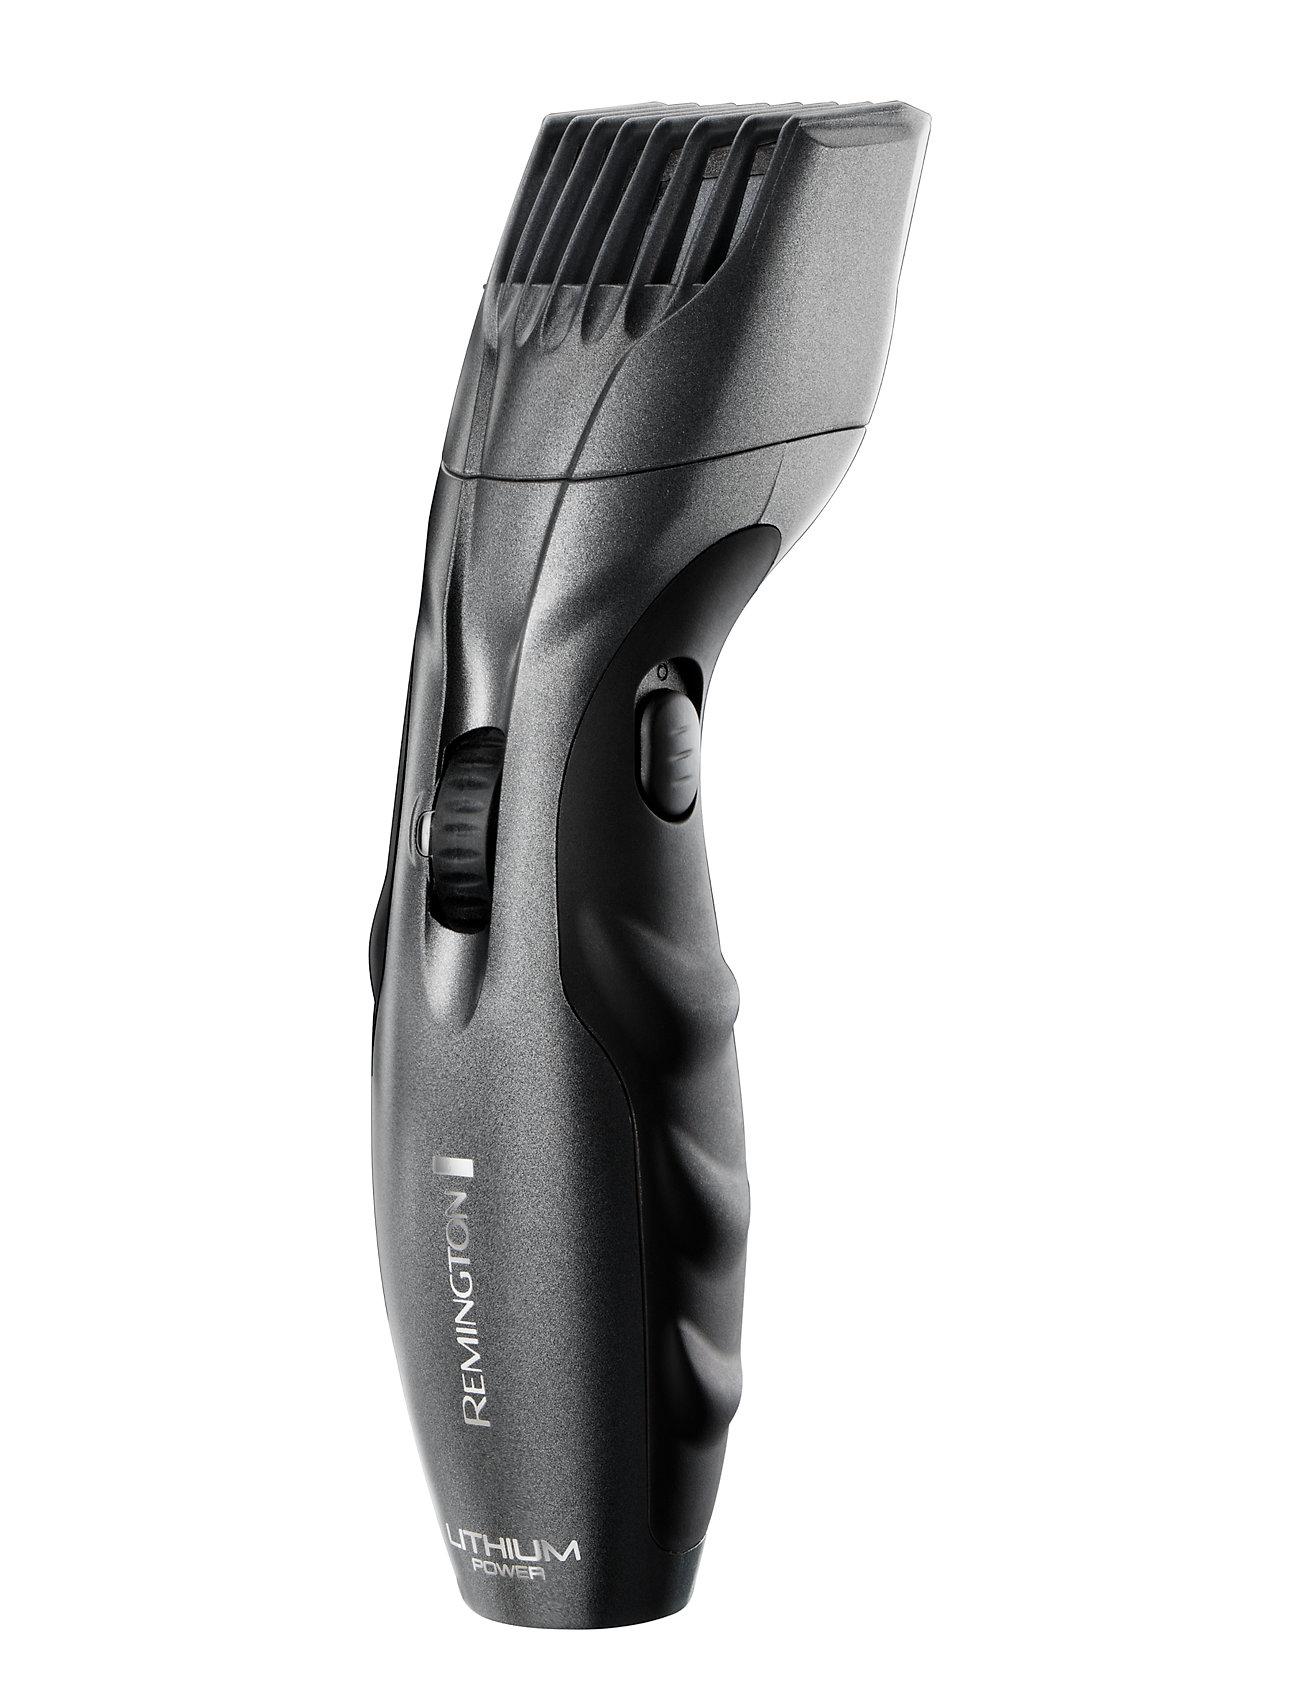 Remington MB350L Lithium Barba Beard Trimmer - NO COLOR